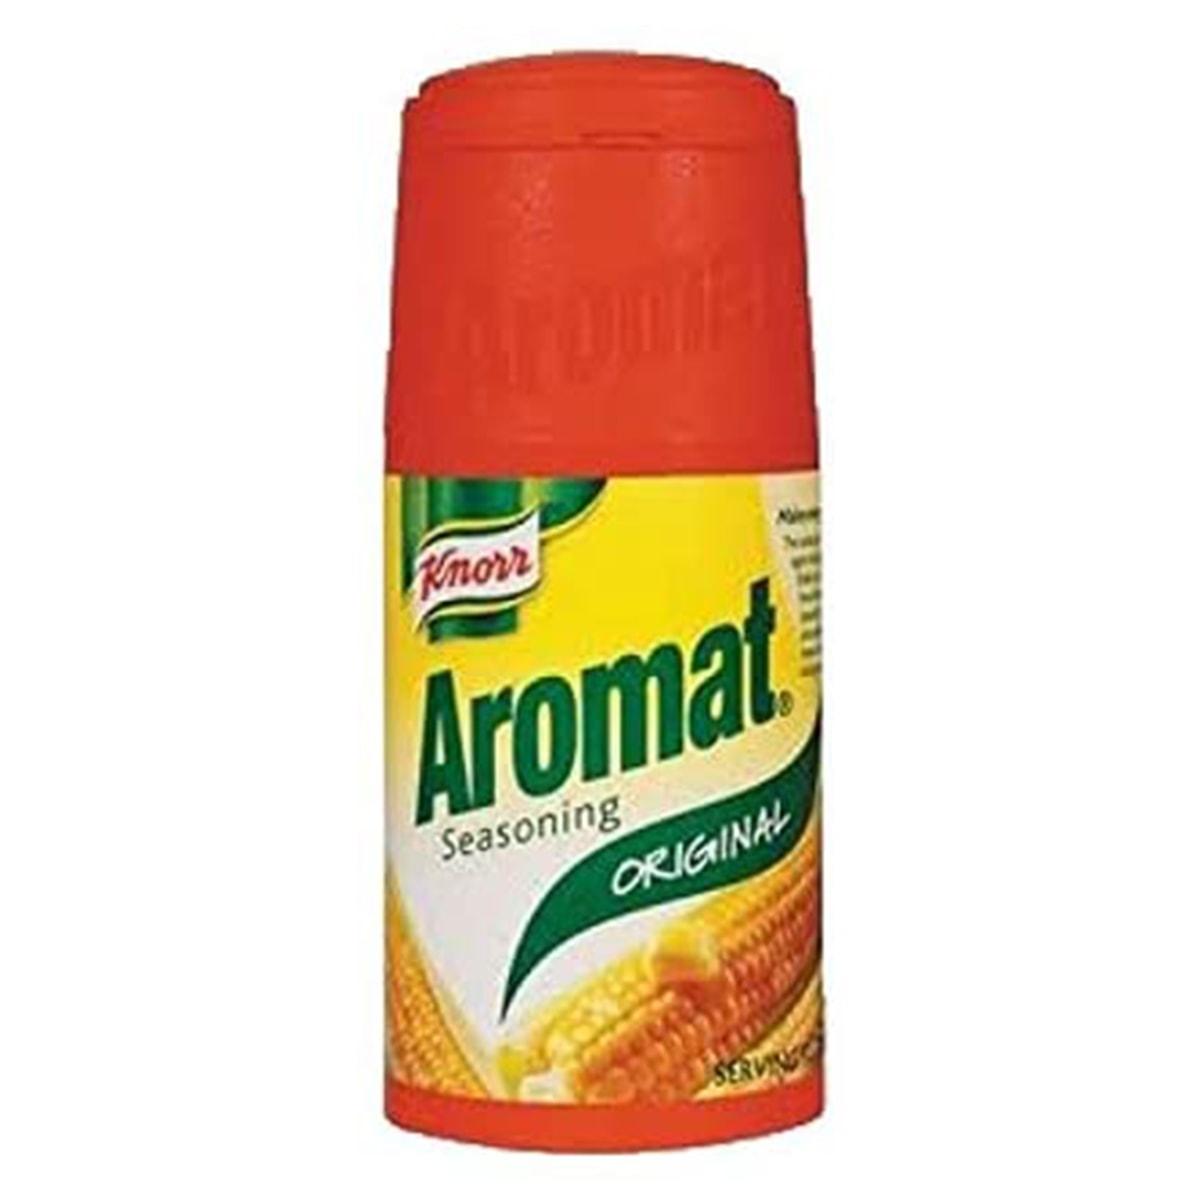 Buy Knorr Aromat Original Seasoning - 200 gm